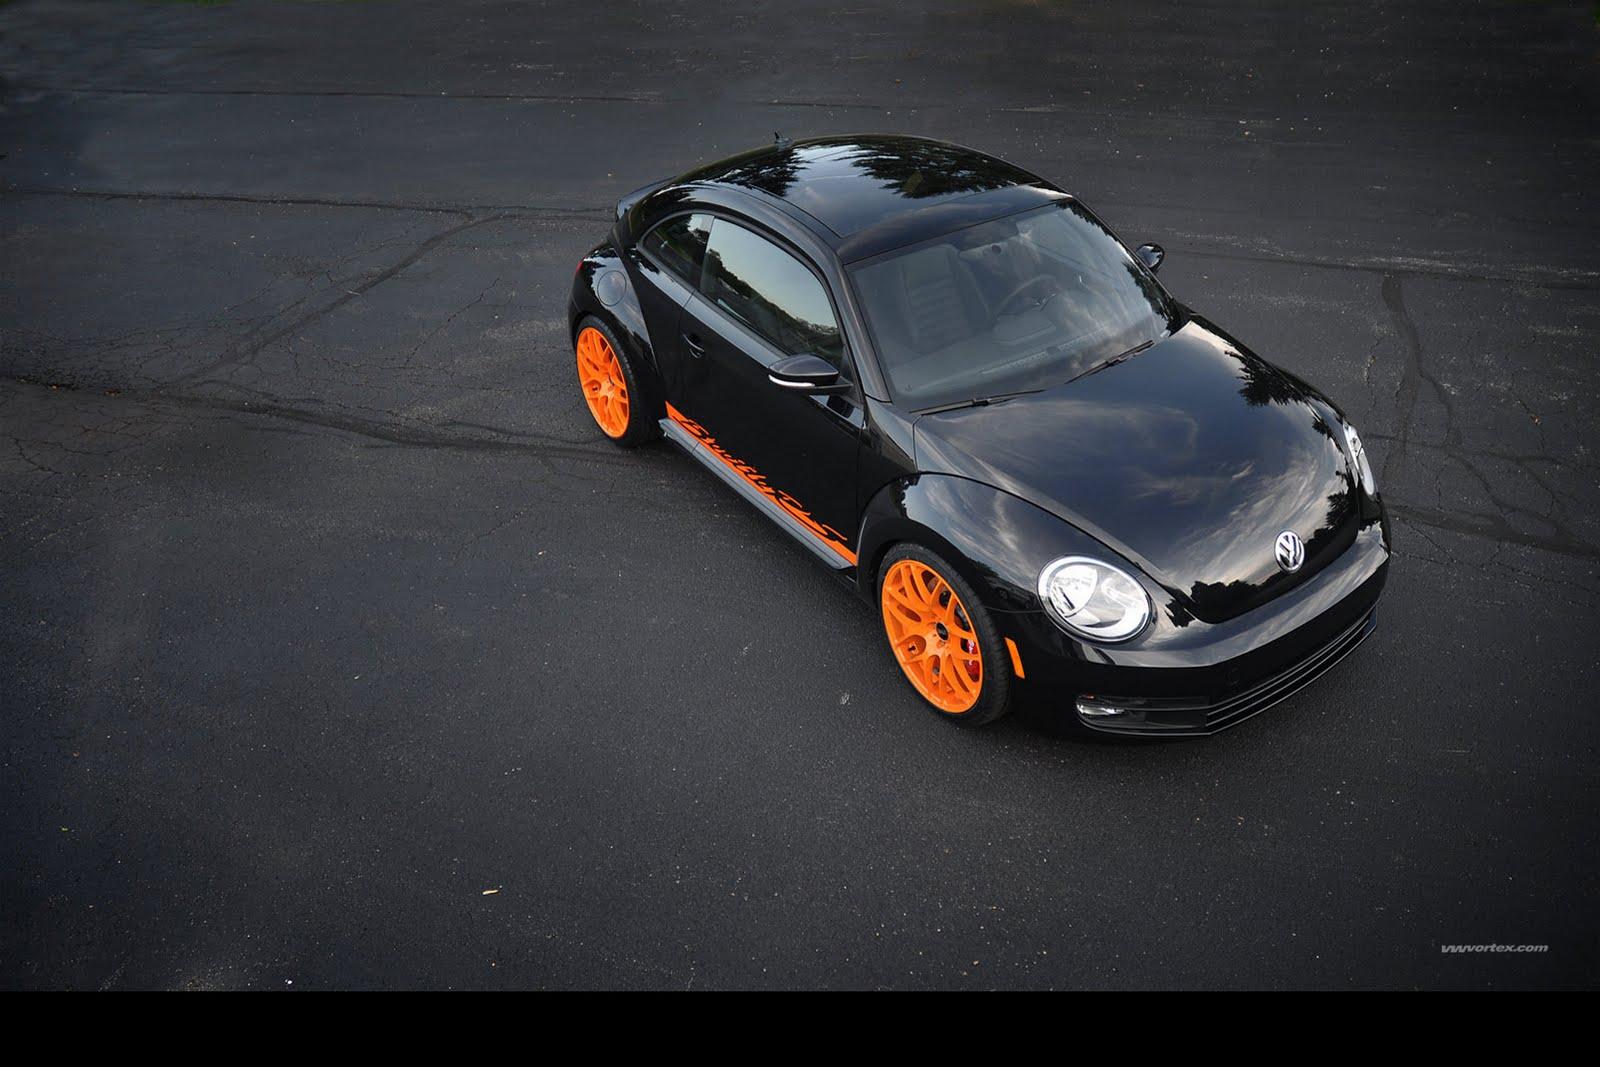 2012 Volkswagen Beetle Inspired by the Porsche 911 GT3 RS   Auto